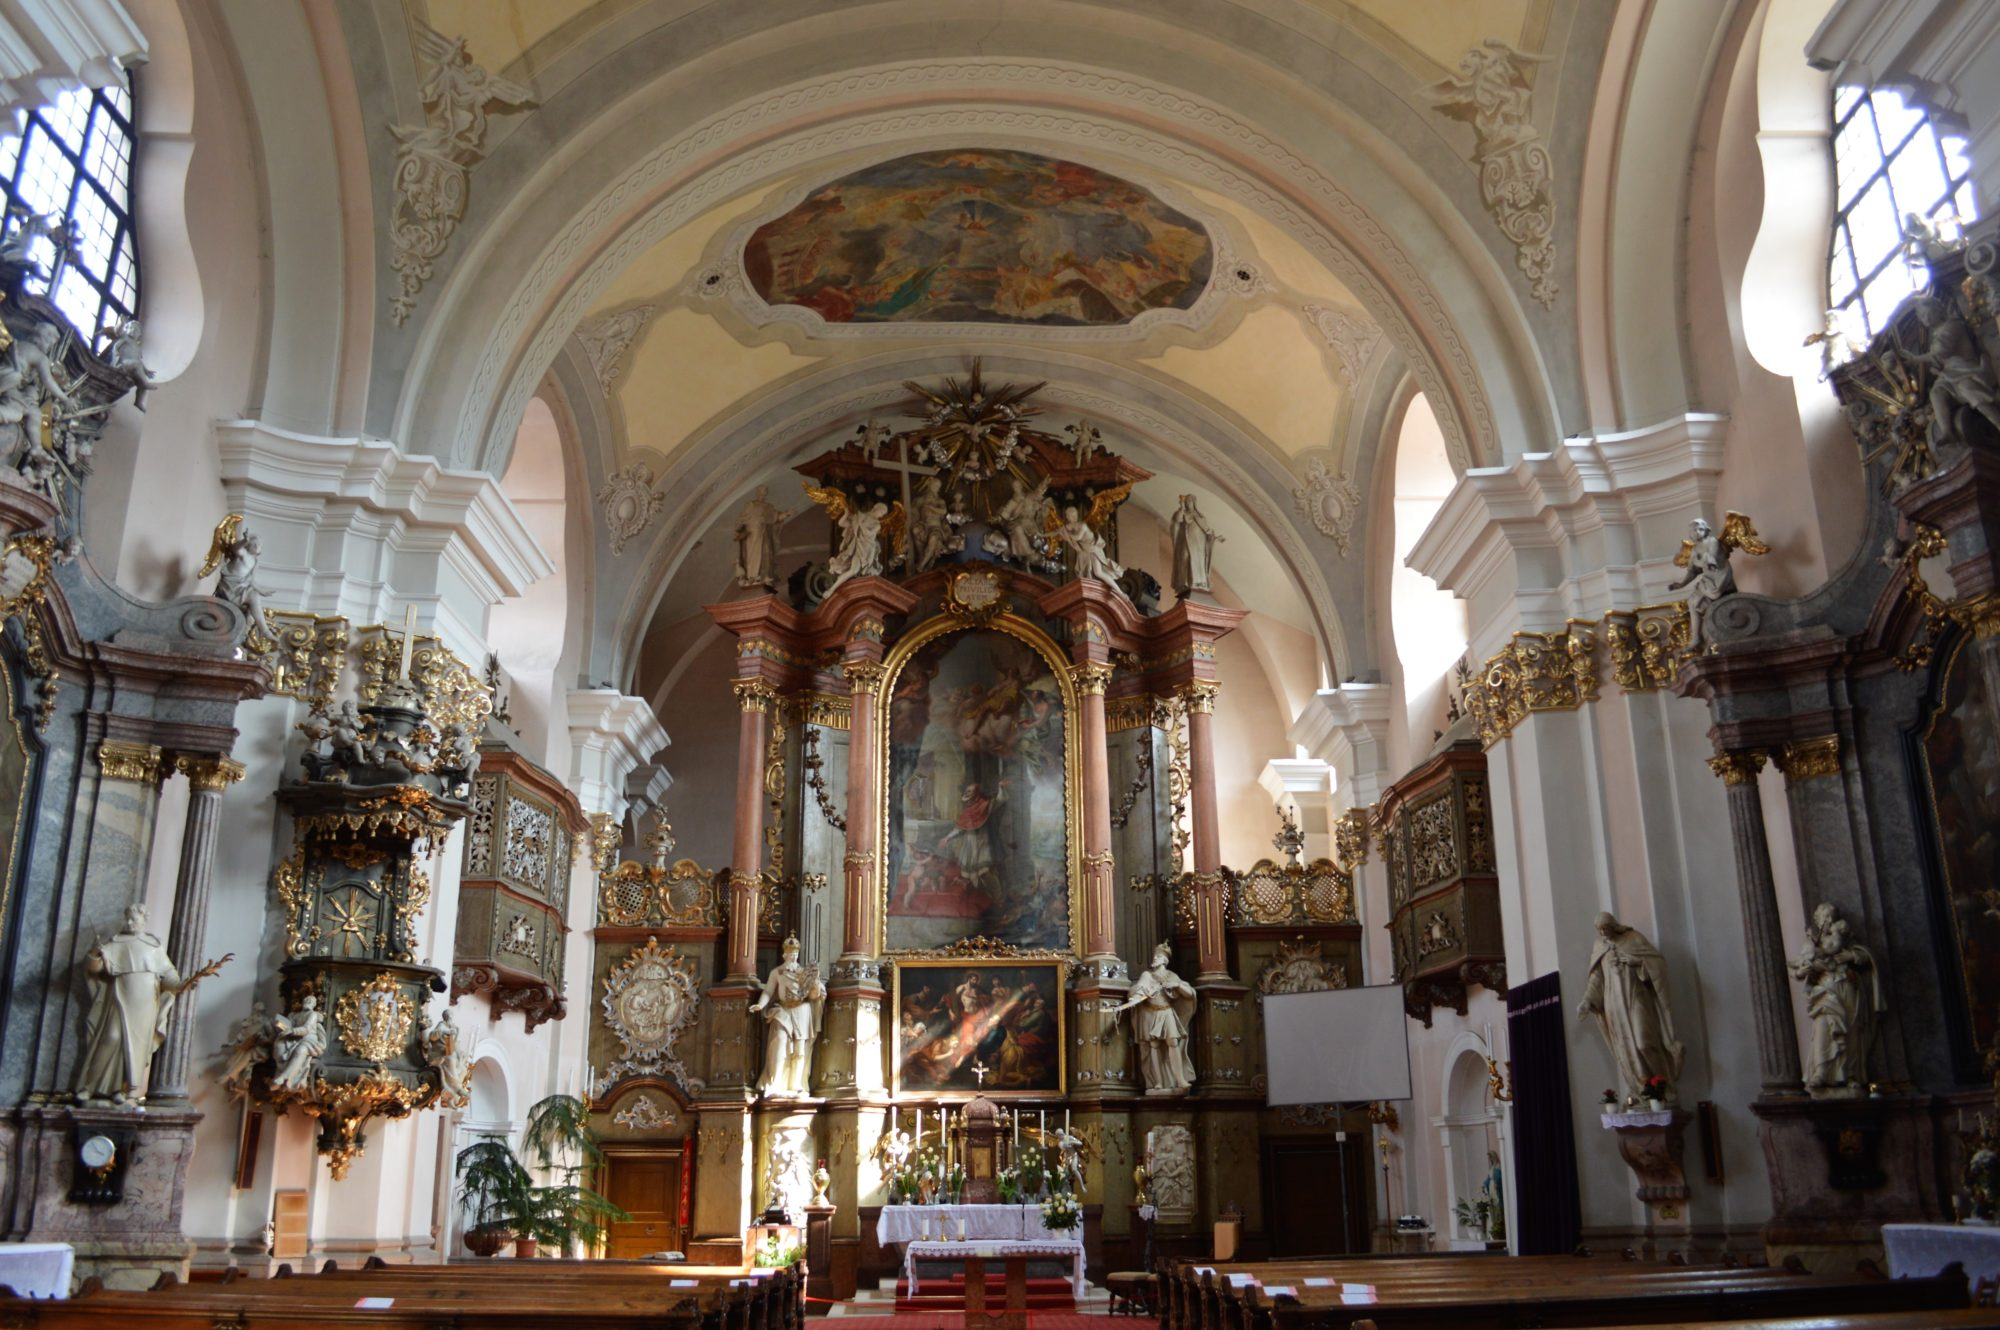 vac-white-church-inside